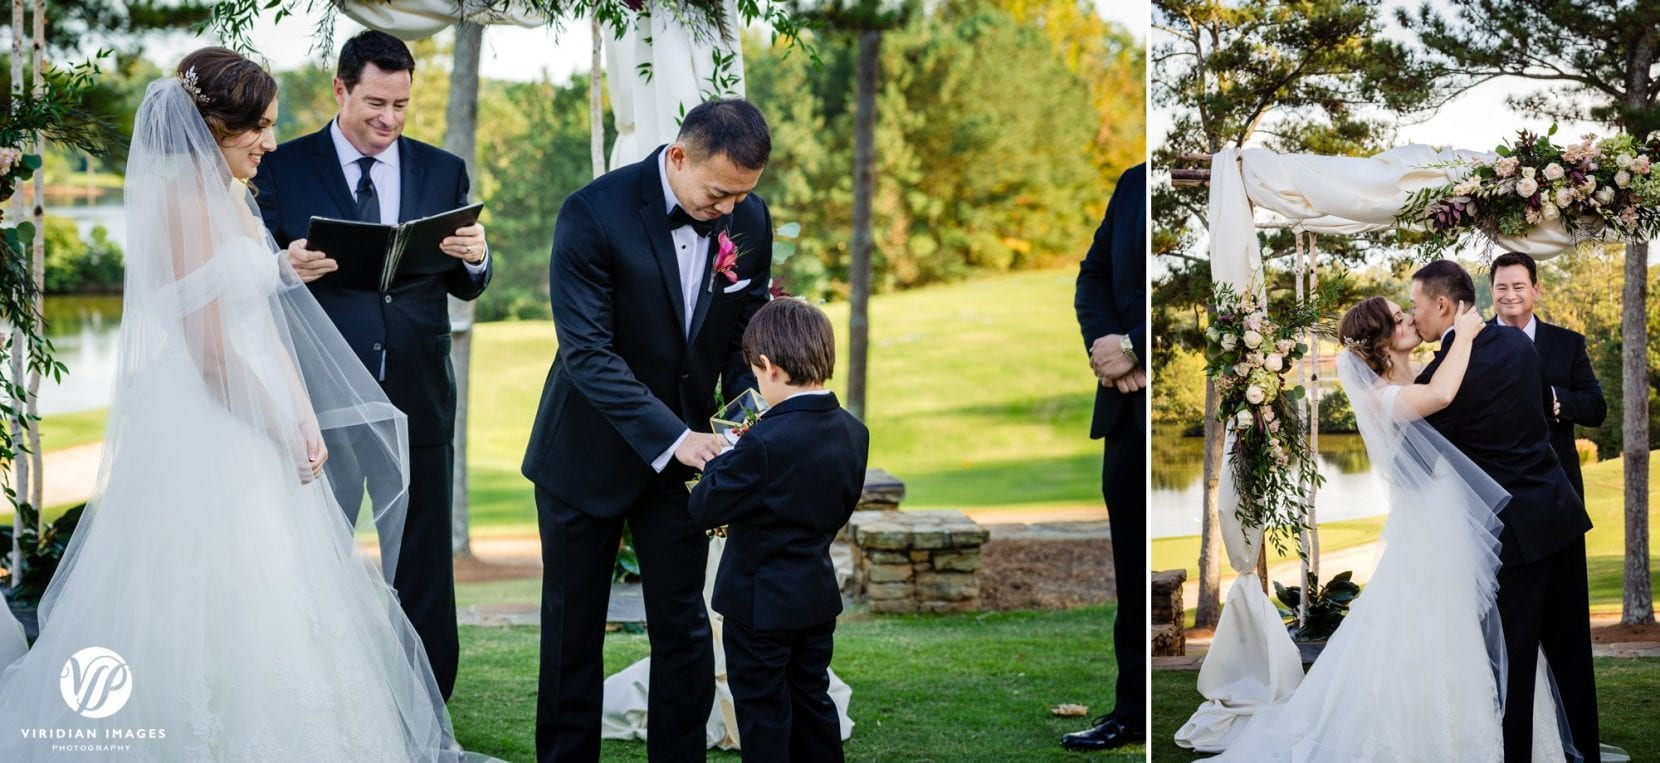 ring bearer bringing ring to groom